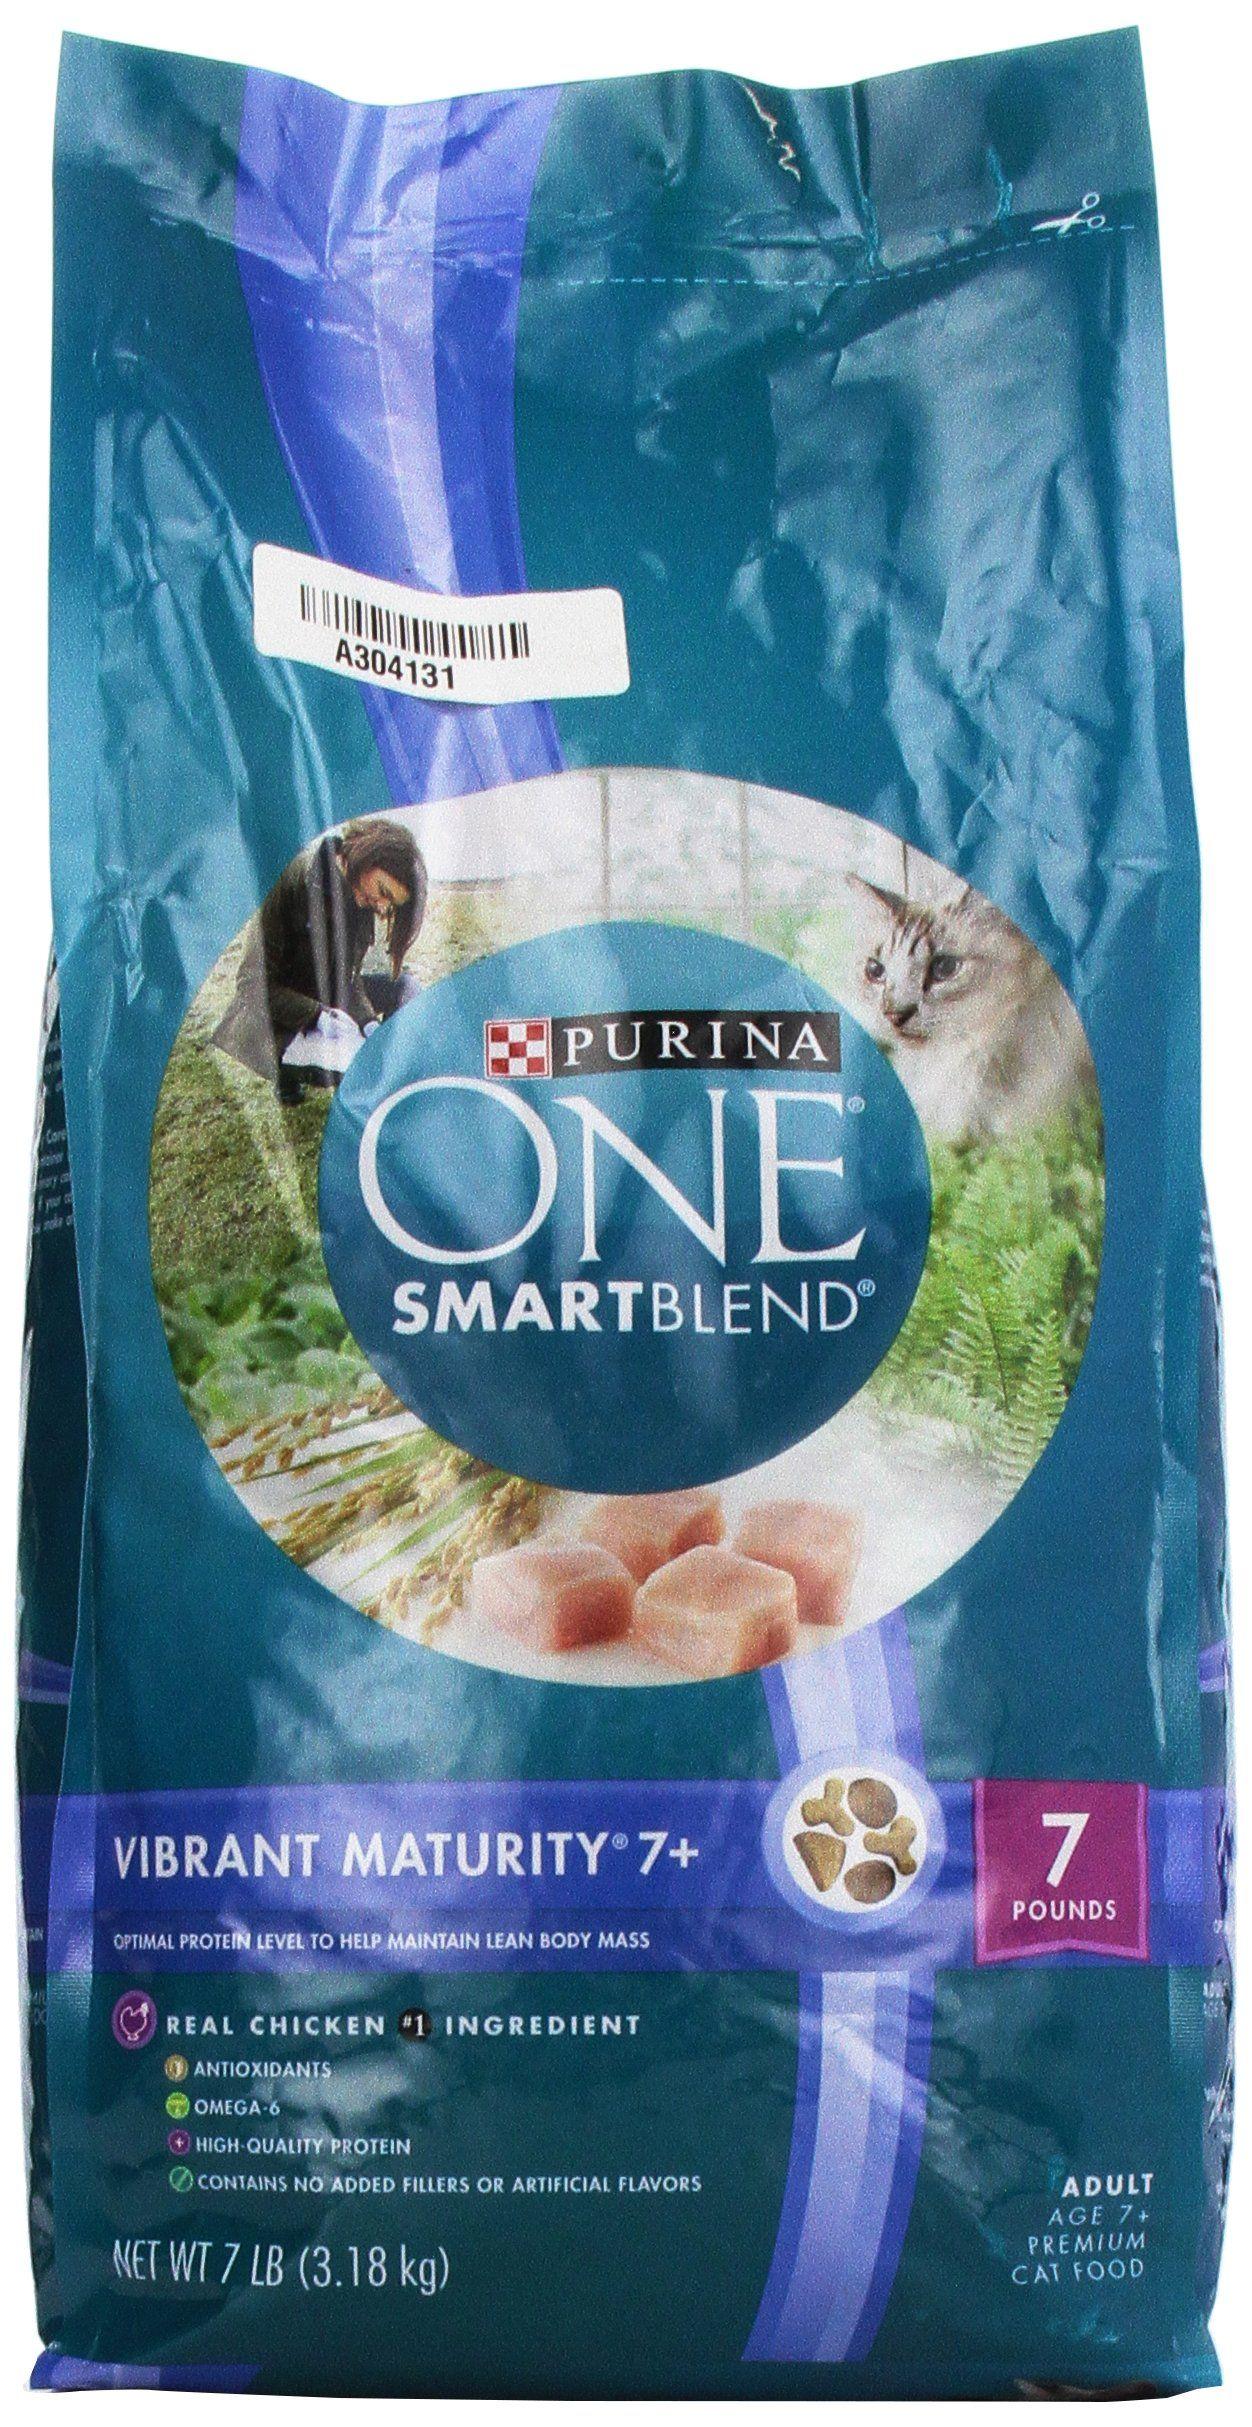 Purina one vibrant maturity cat food